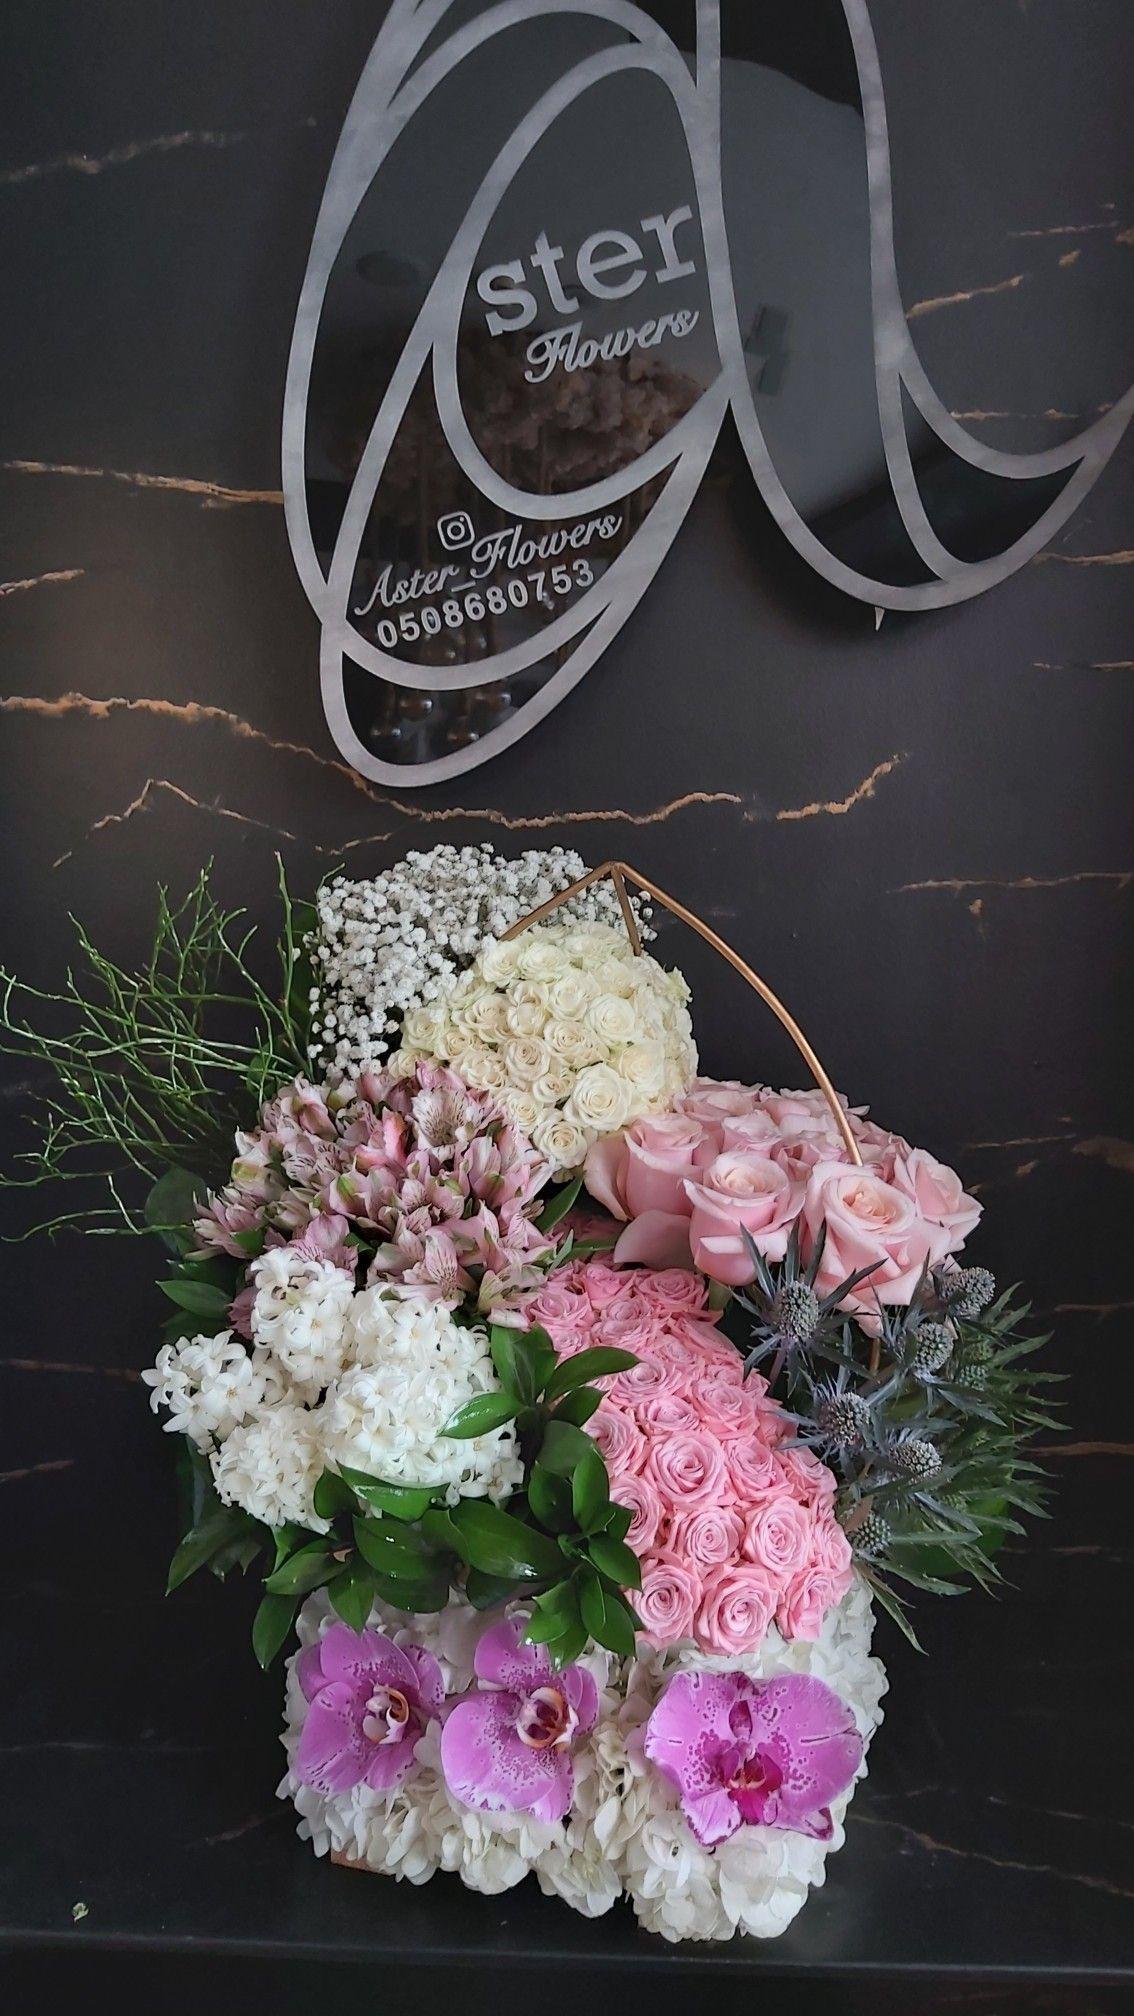 Pin On Designer Flowers In Dubai Aster Flowers Shop